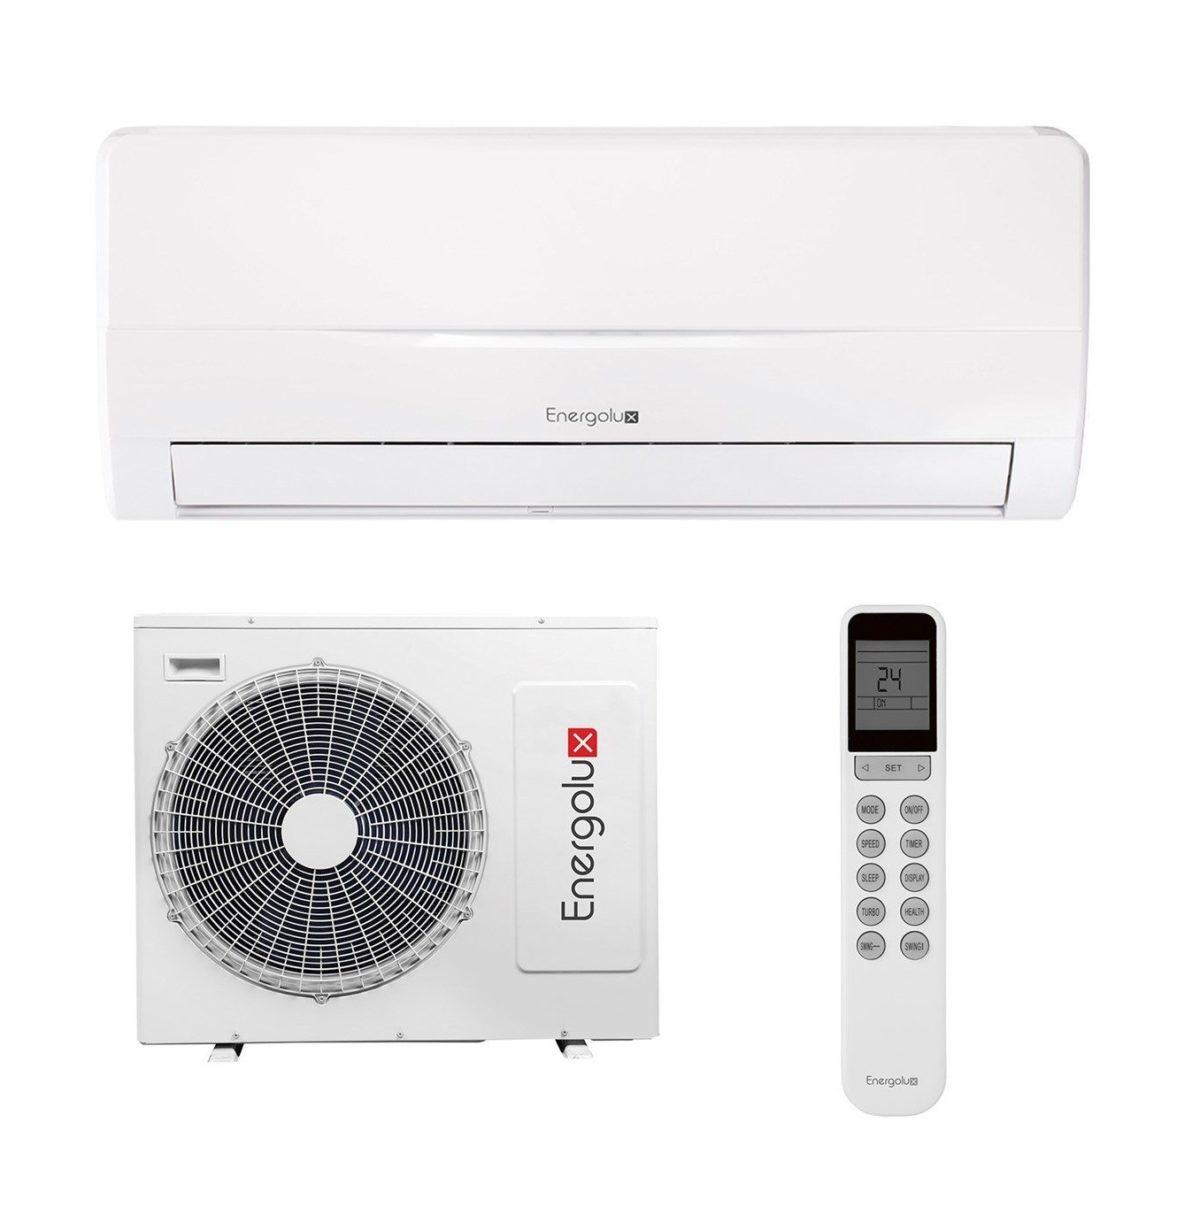 Сплит-система Energolux SAS07L2-A/SAU07L2-A